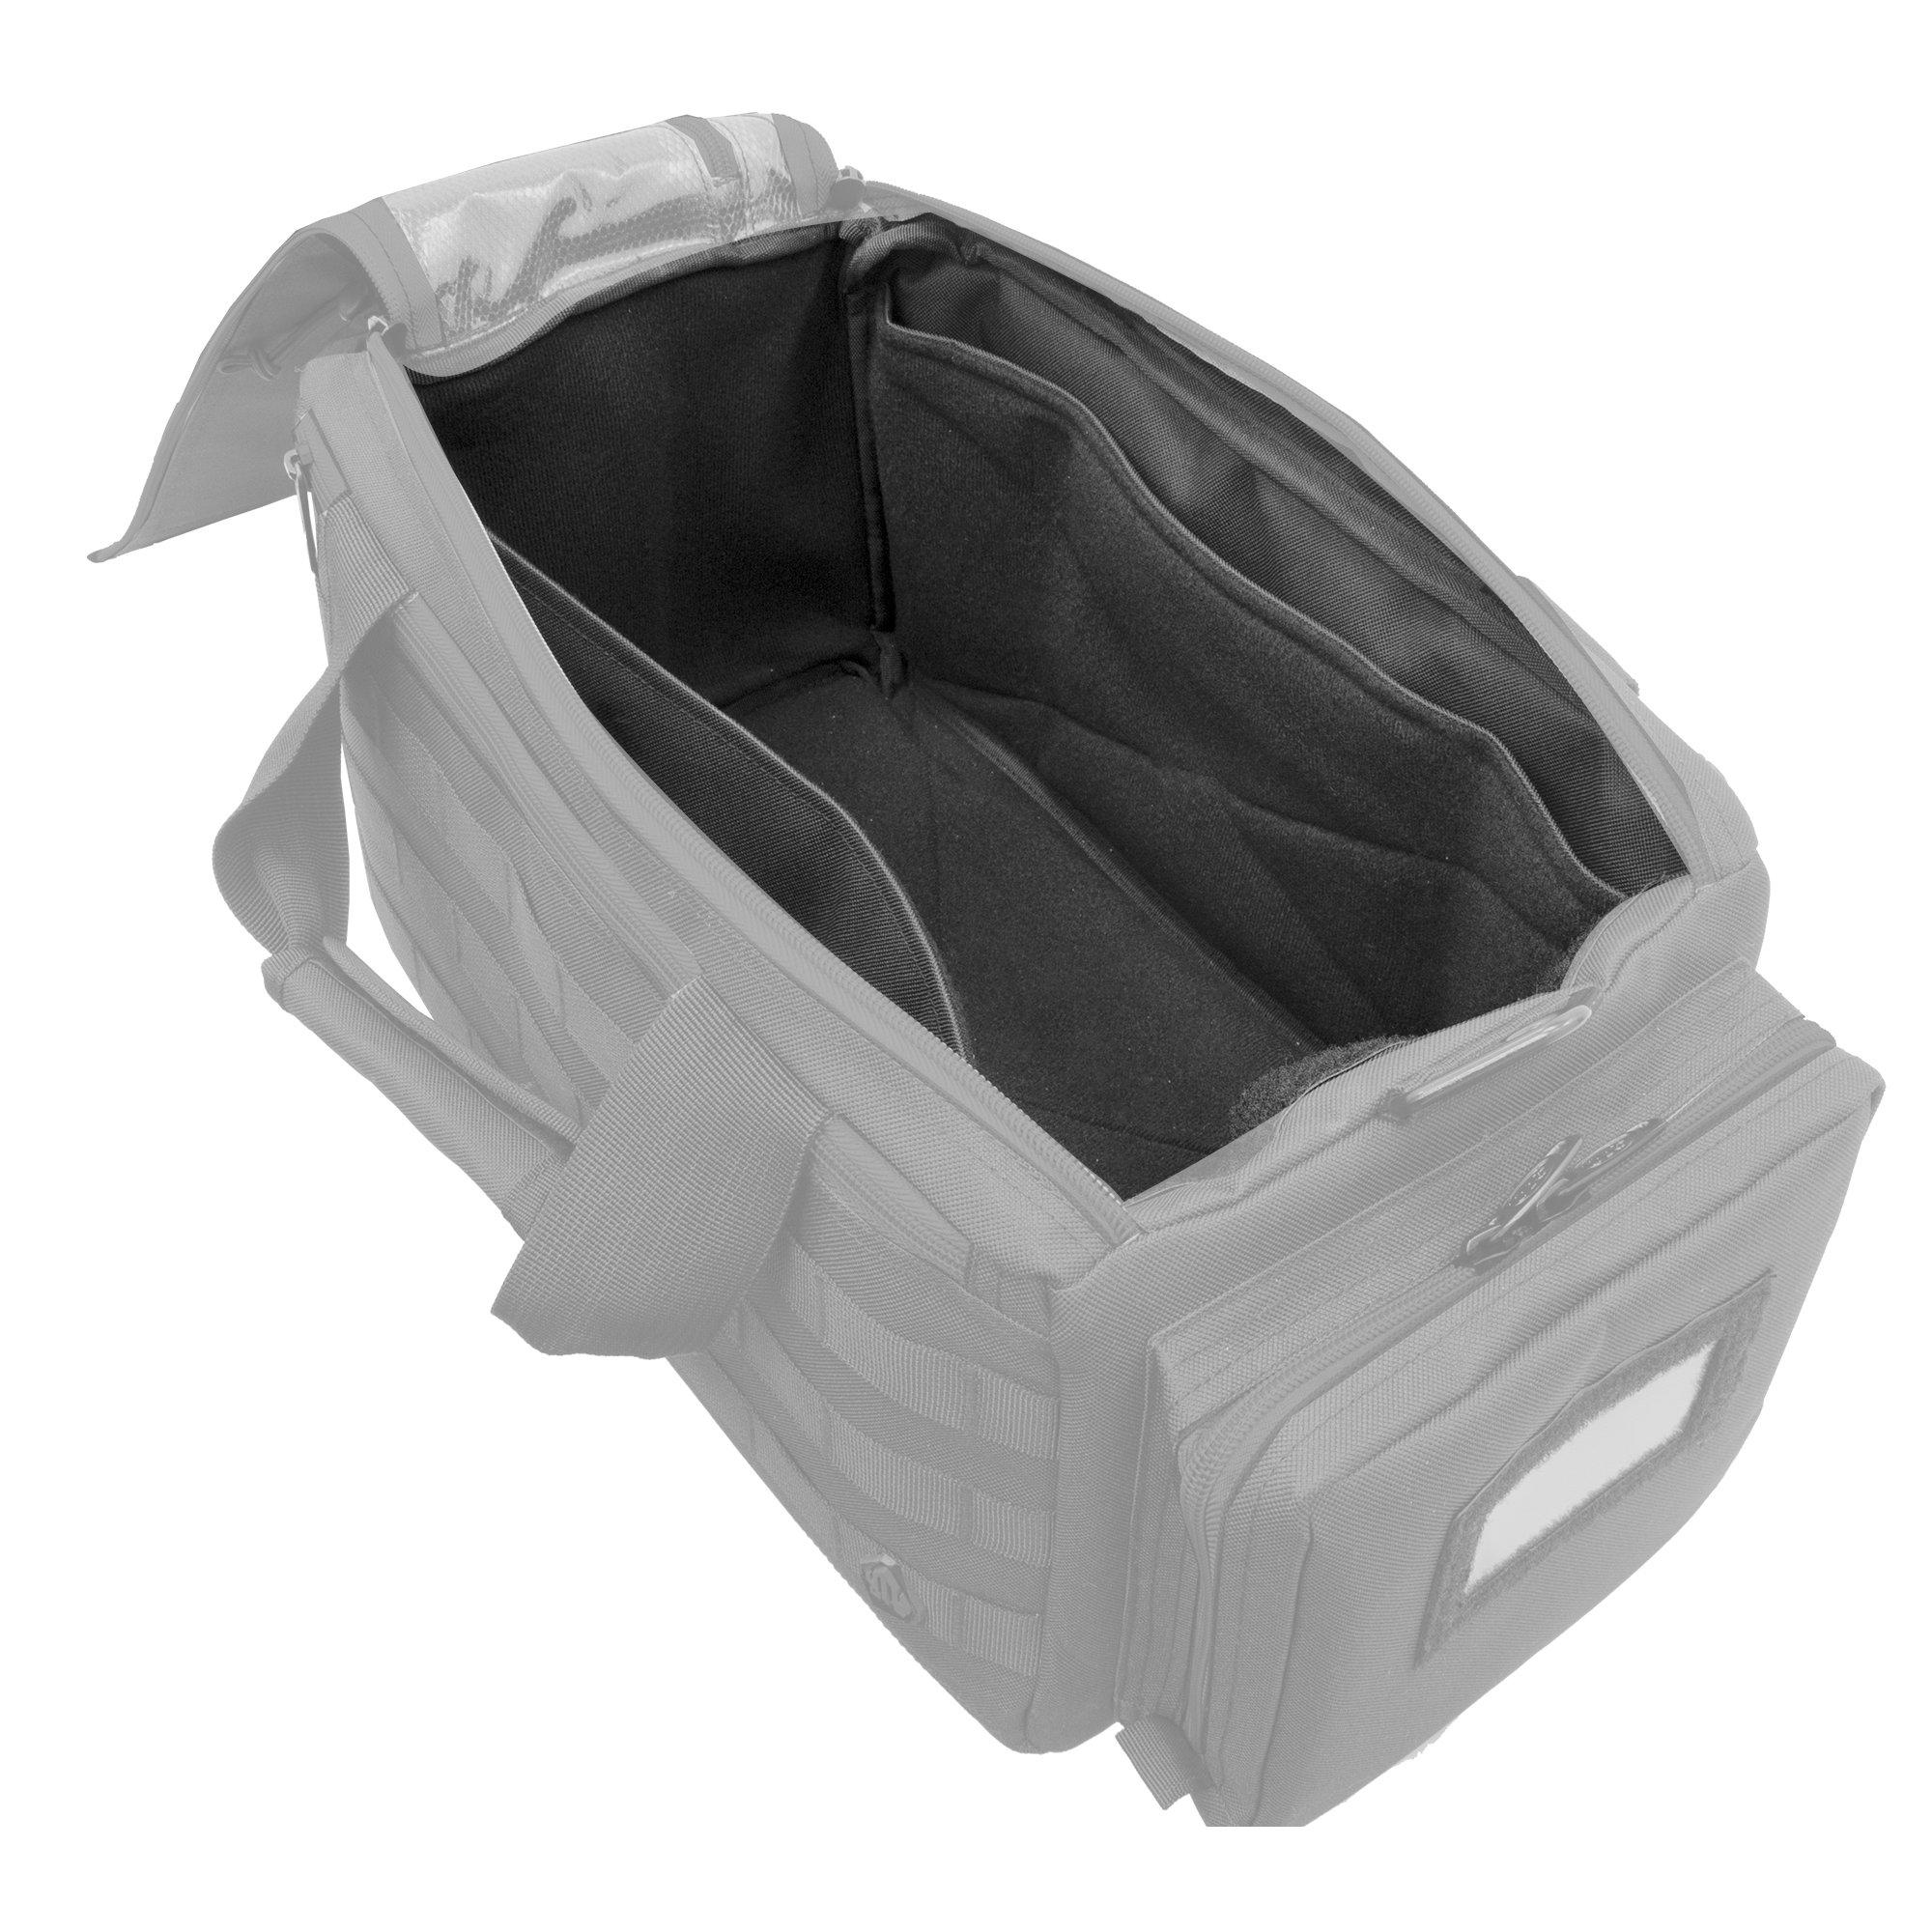 UTG All in One Range/Utility Go Bag, Black, 21'' x 10'' x 9'' by UTG (Image #8)